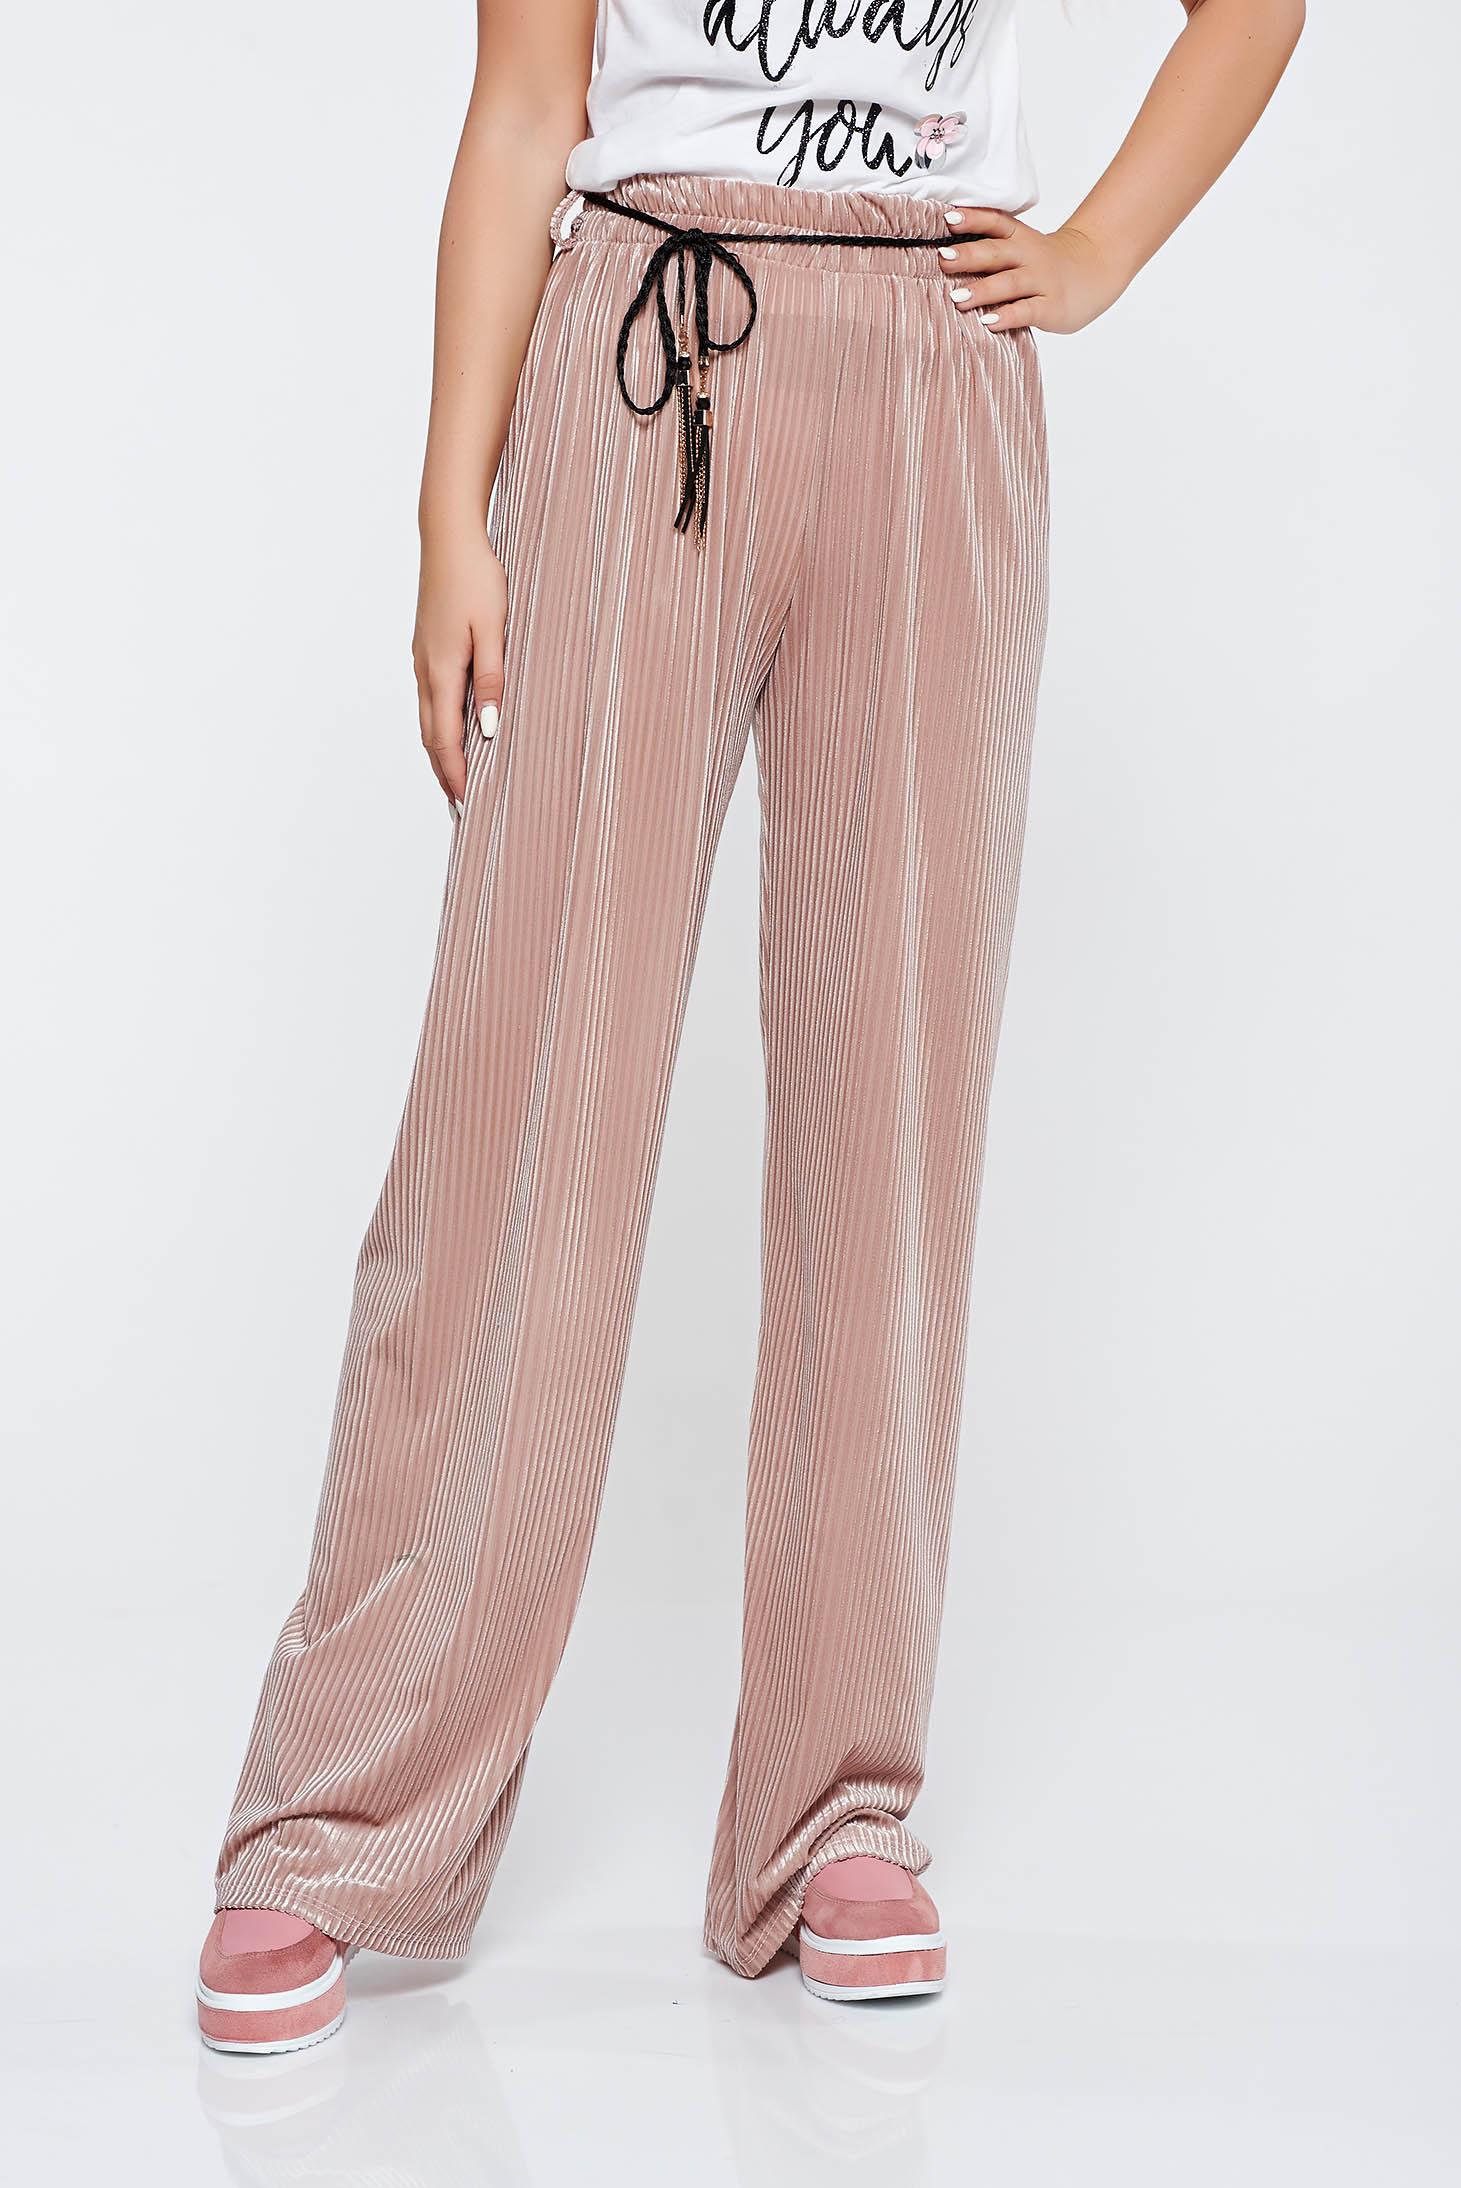 Pantaloni rosa casual cu croi larg cu elastic in talie